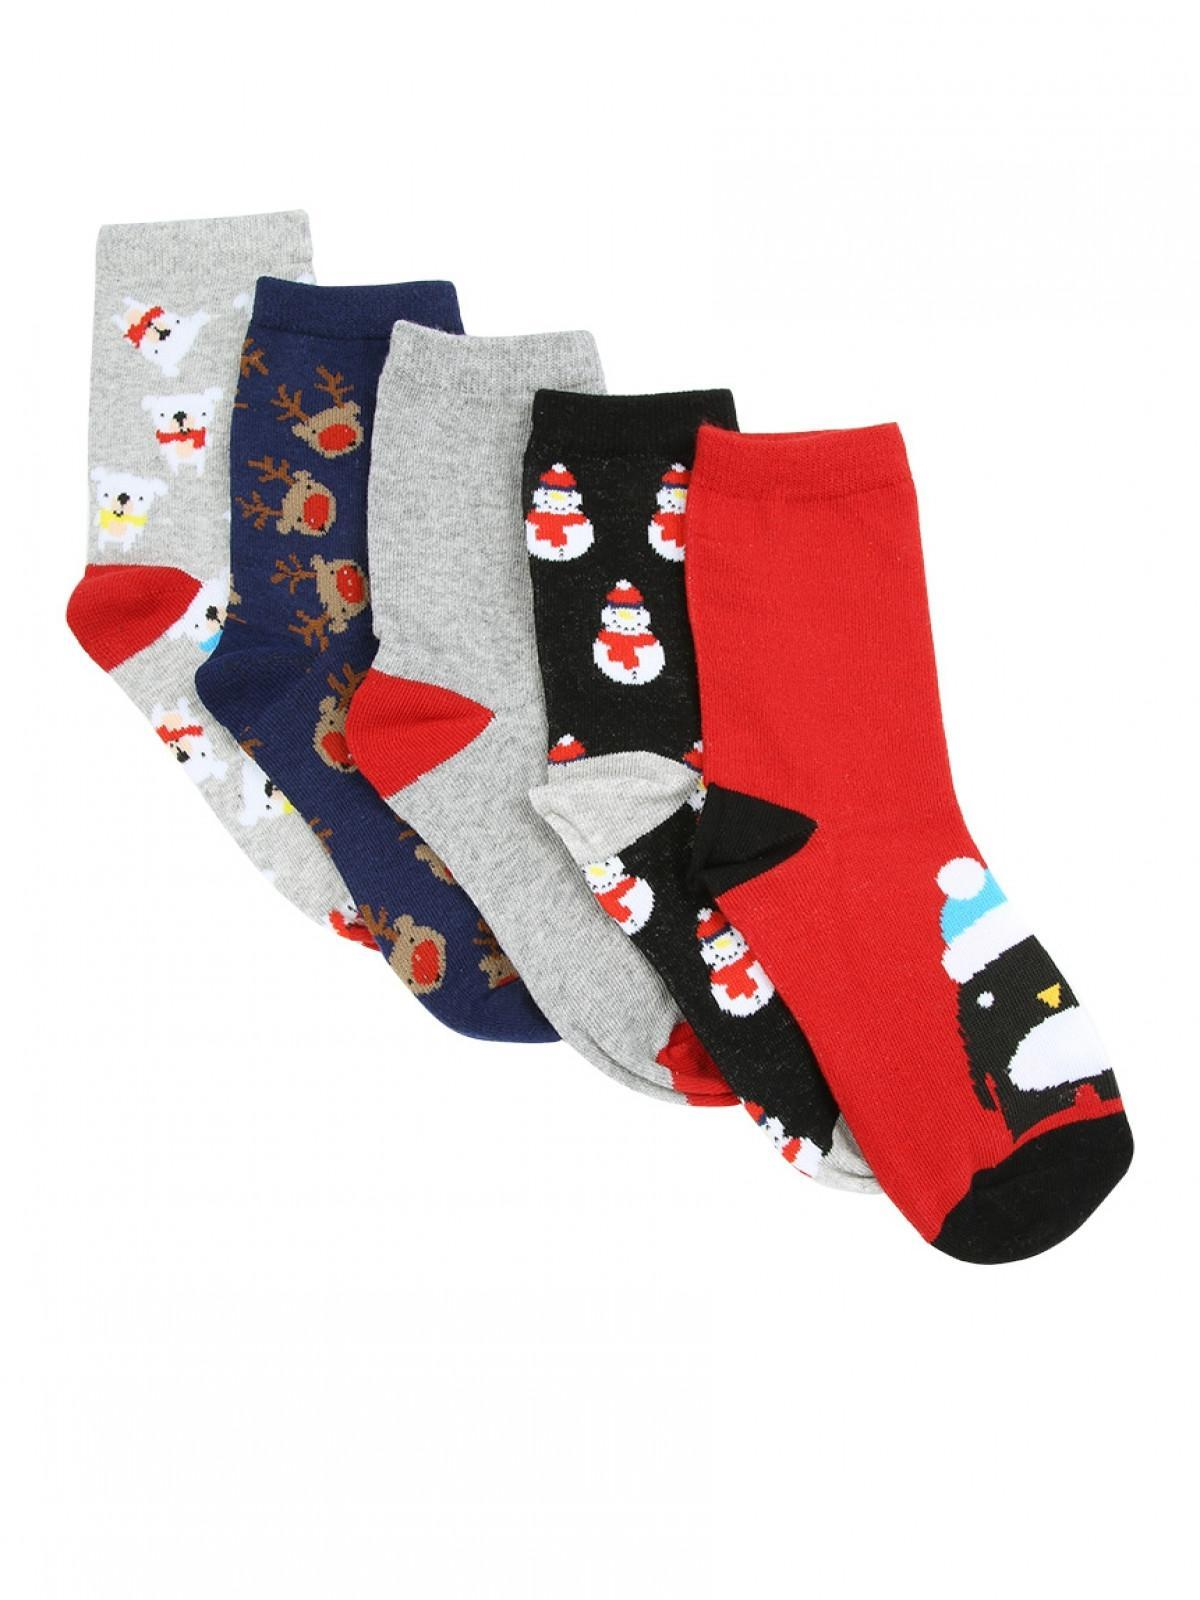 Boys Christmas Socks.Boys 5pk Black Christmas Socks Peacocks